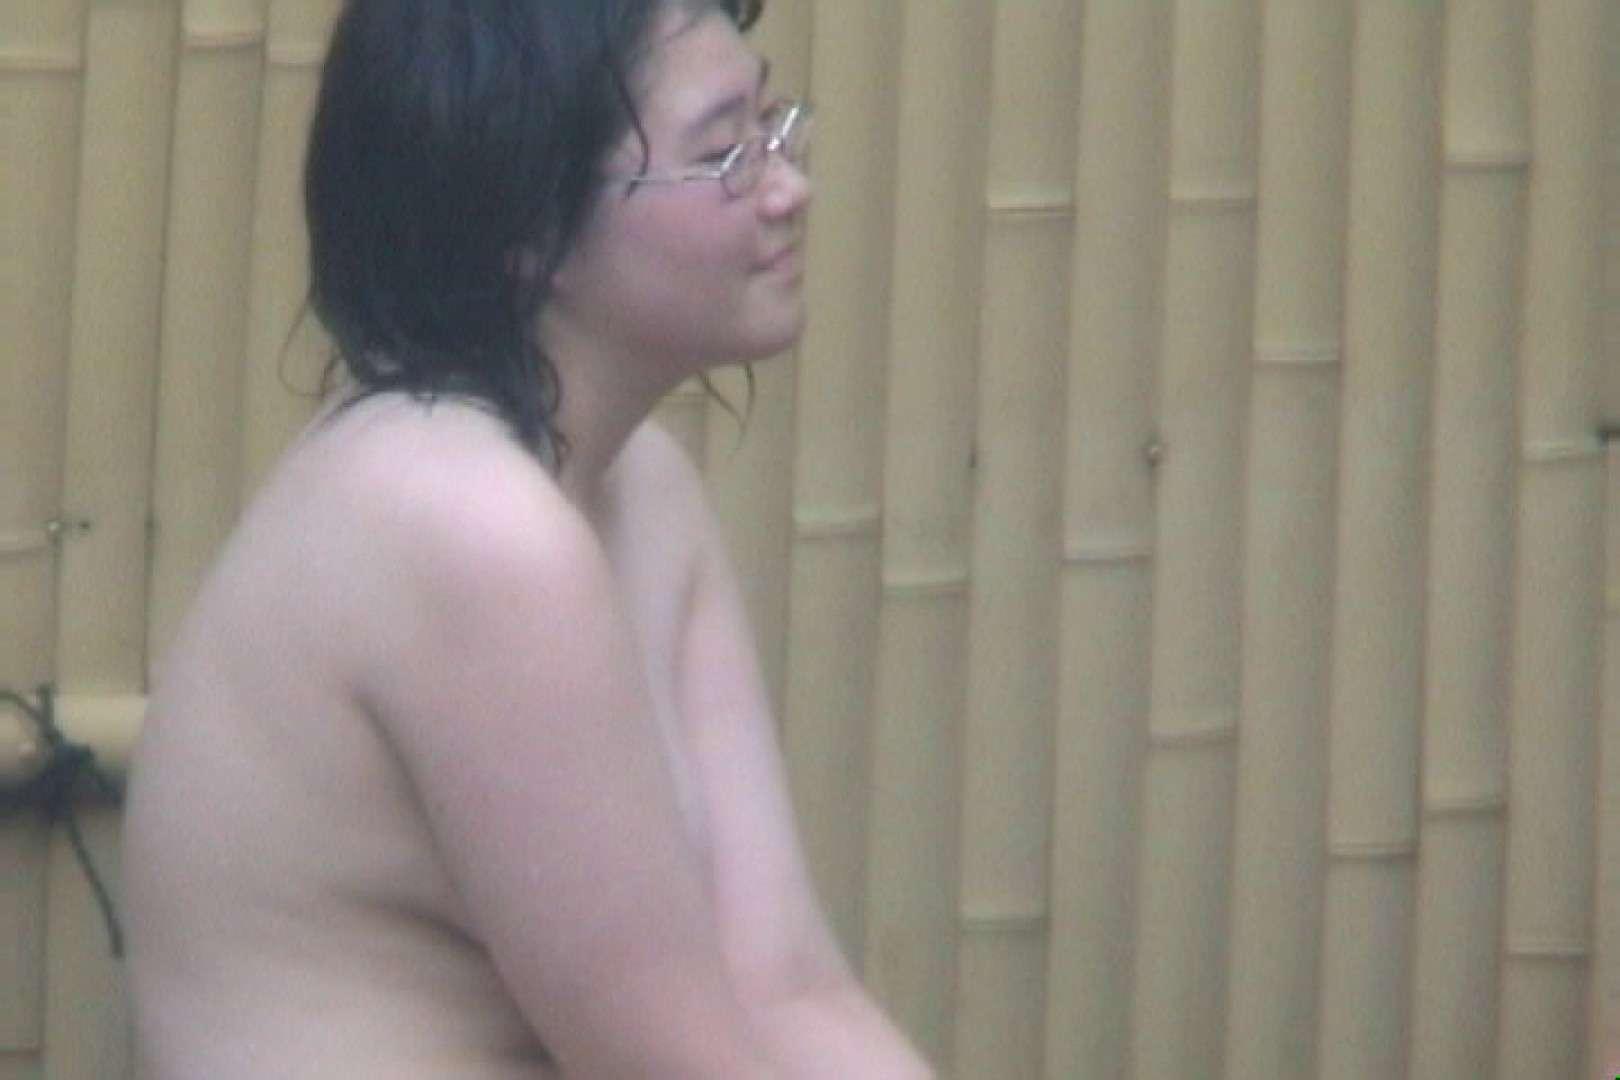 Aquaな露天風呂Vol.46【VIP限定】 HなOL | 露天  90pic 4